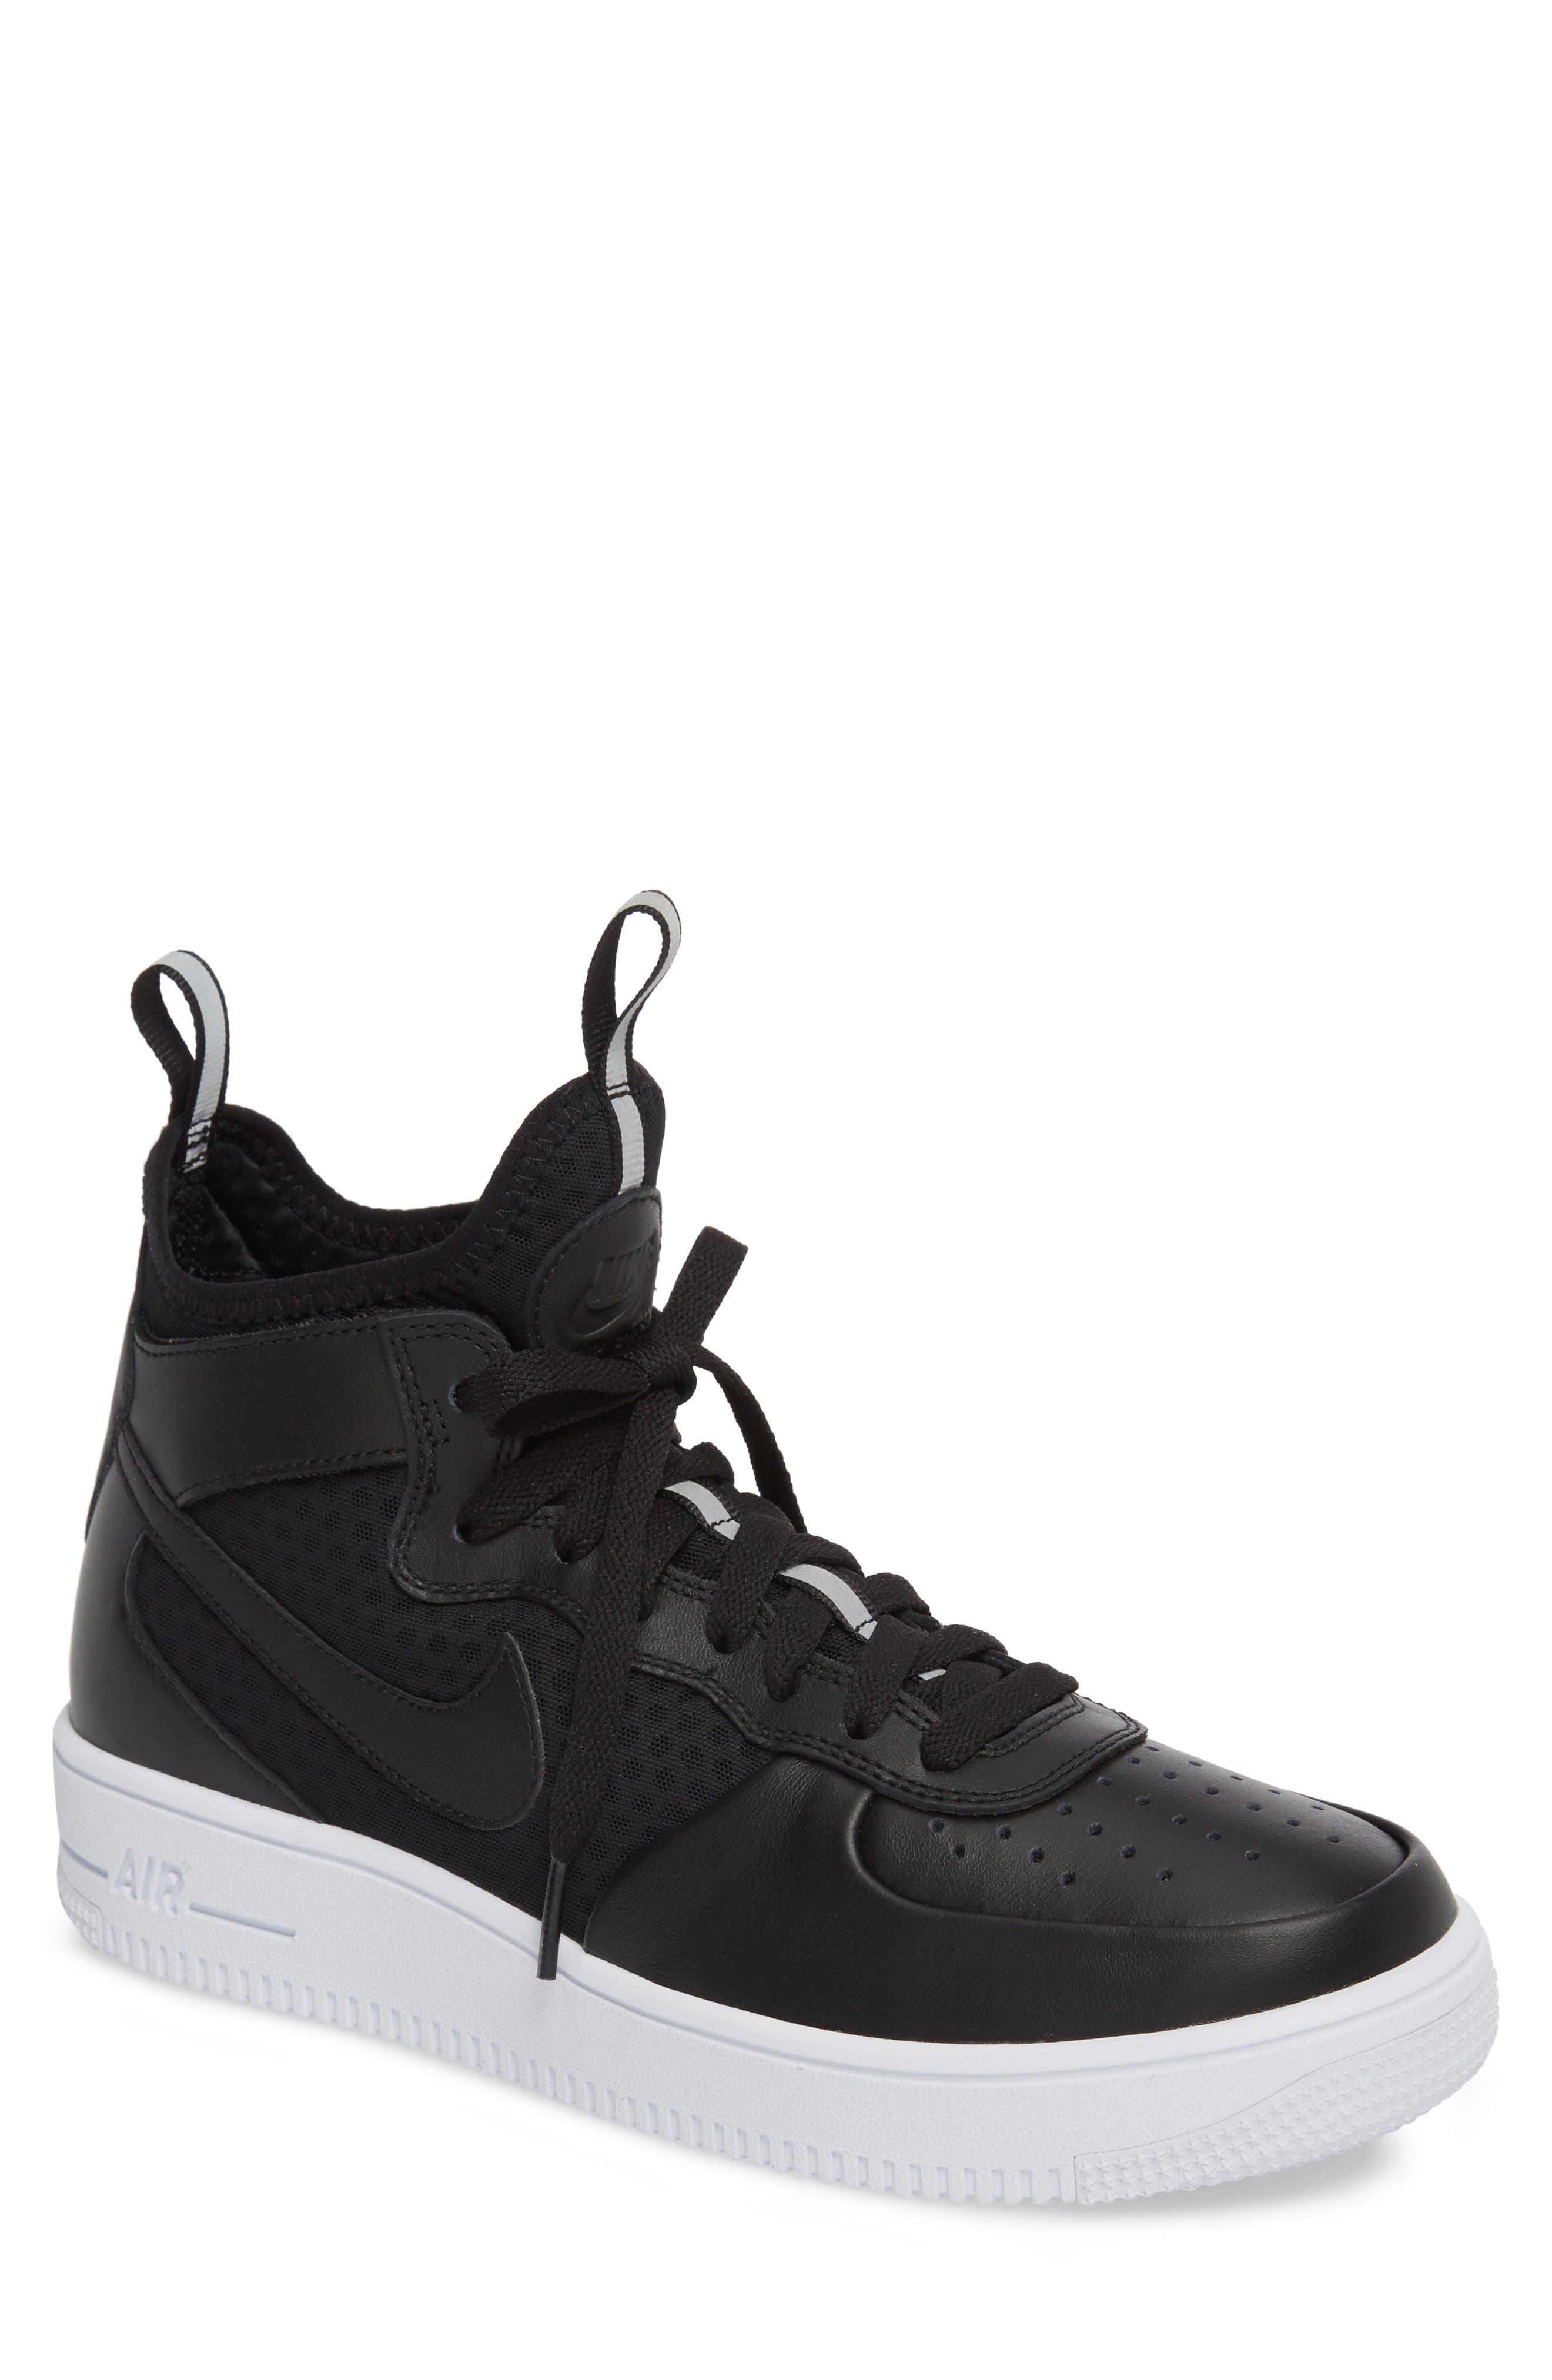 Air Force 1 Ultraforce Mid Sneaker,                             Main thumbnail 1, color,                             001